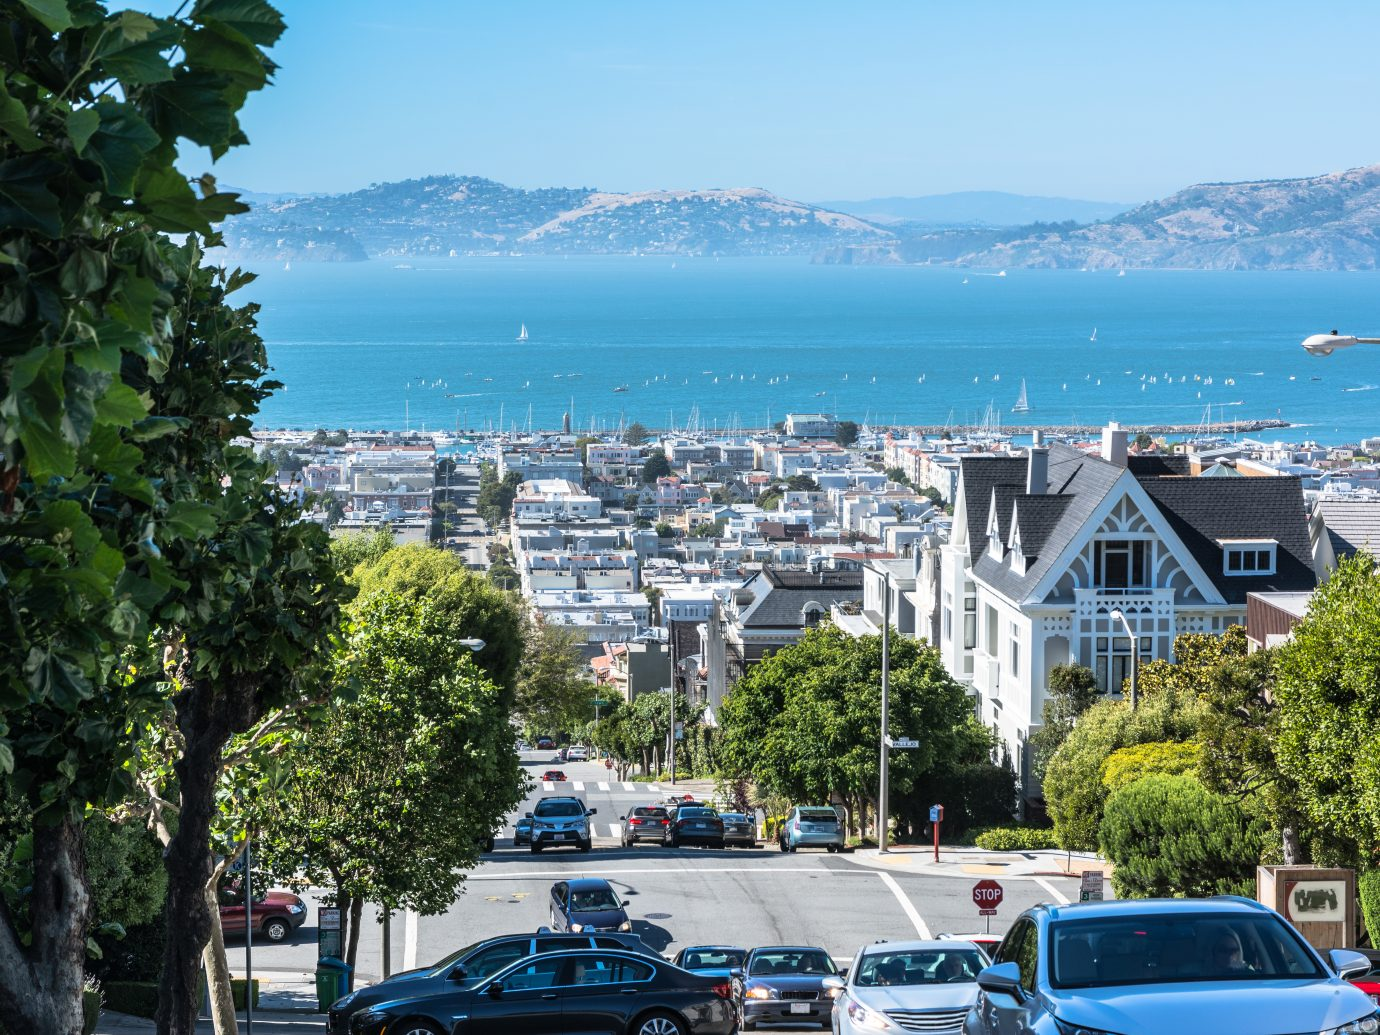 View of the San Francisco Bay from Divisadero Street, California